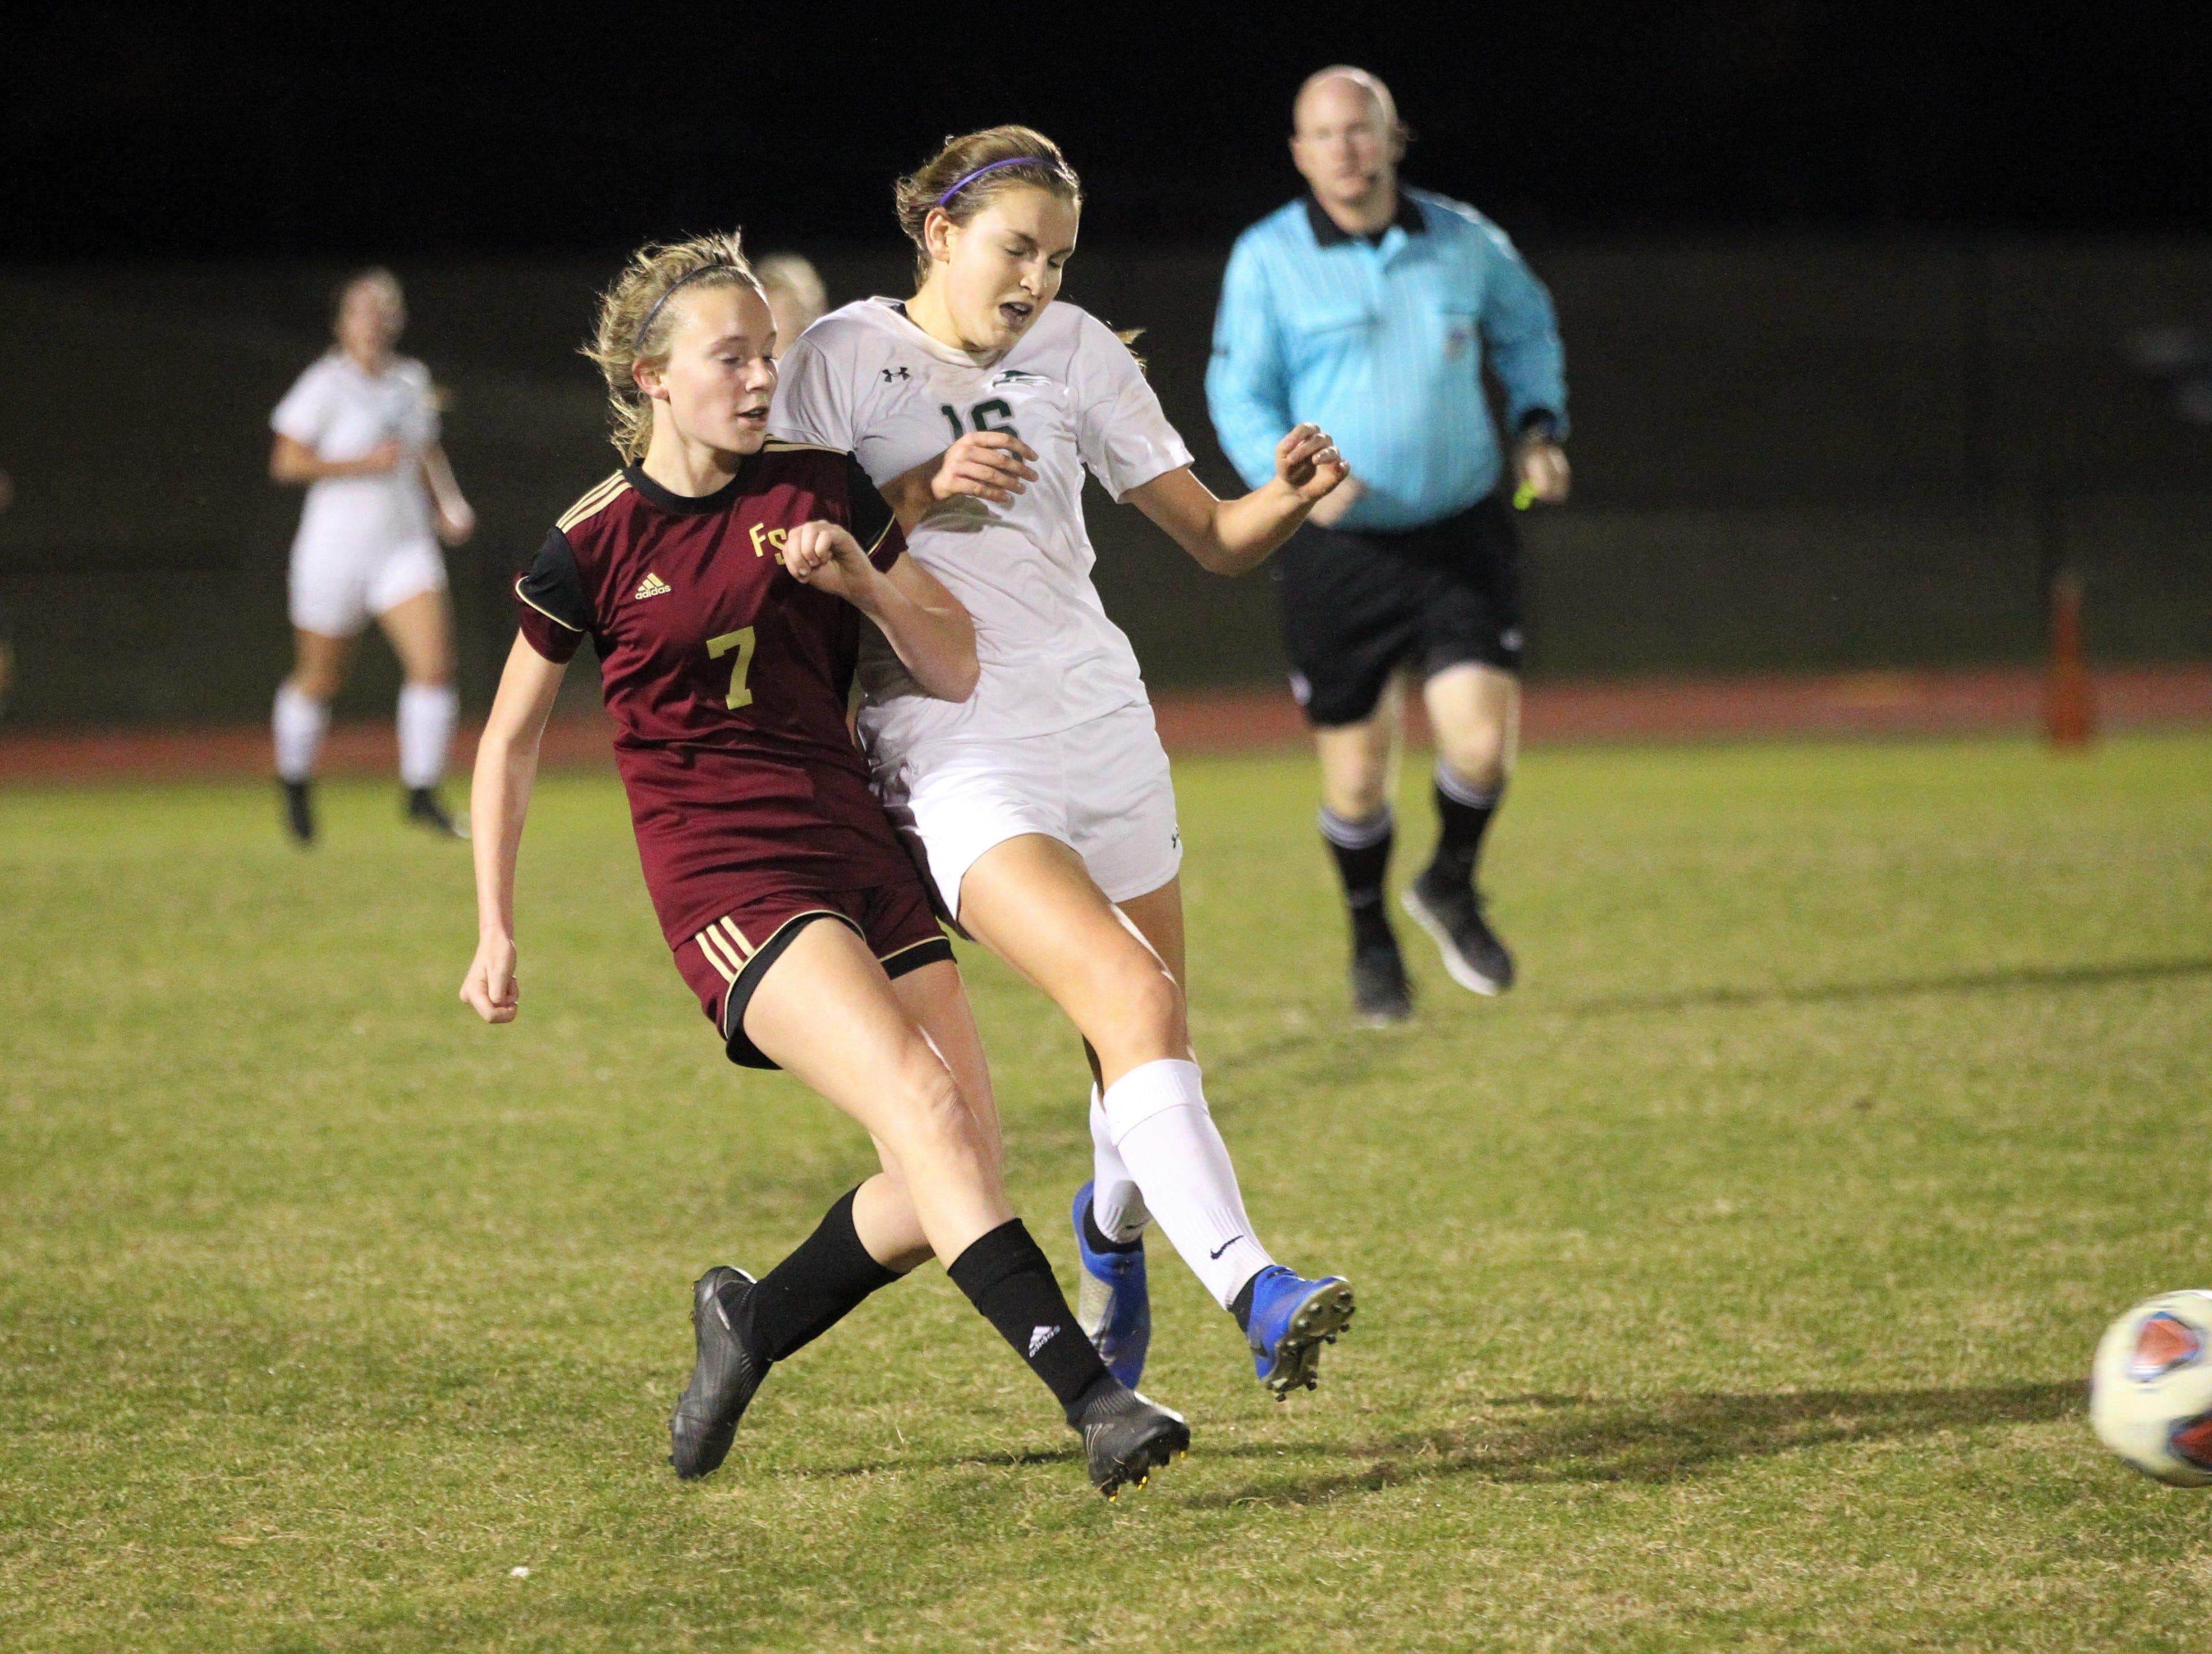 Florida High's Ava Dubois passes ahead under pressure as South Walton's girls soccer team edged the Seminoles 5-4 in a penalty-kick shootout during a Region 1-2A semifinal on Feb. 8, 2019.